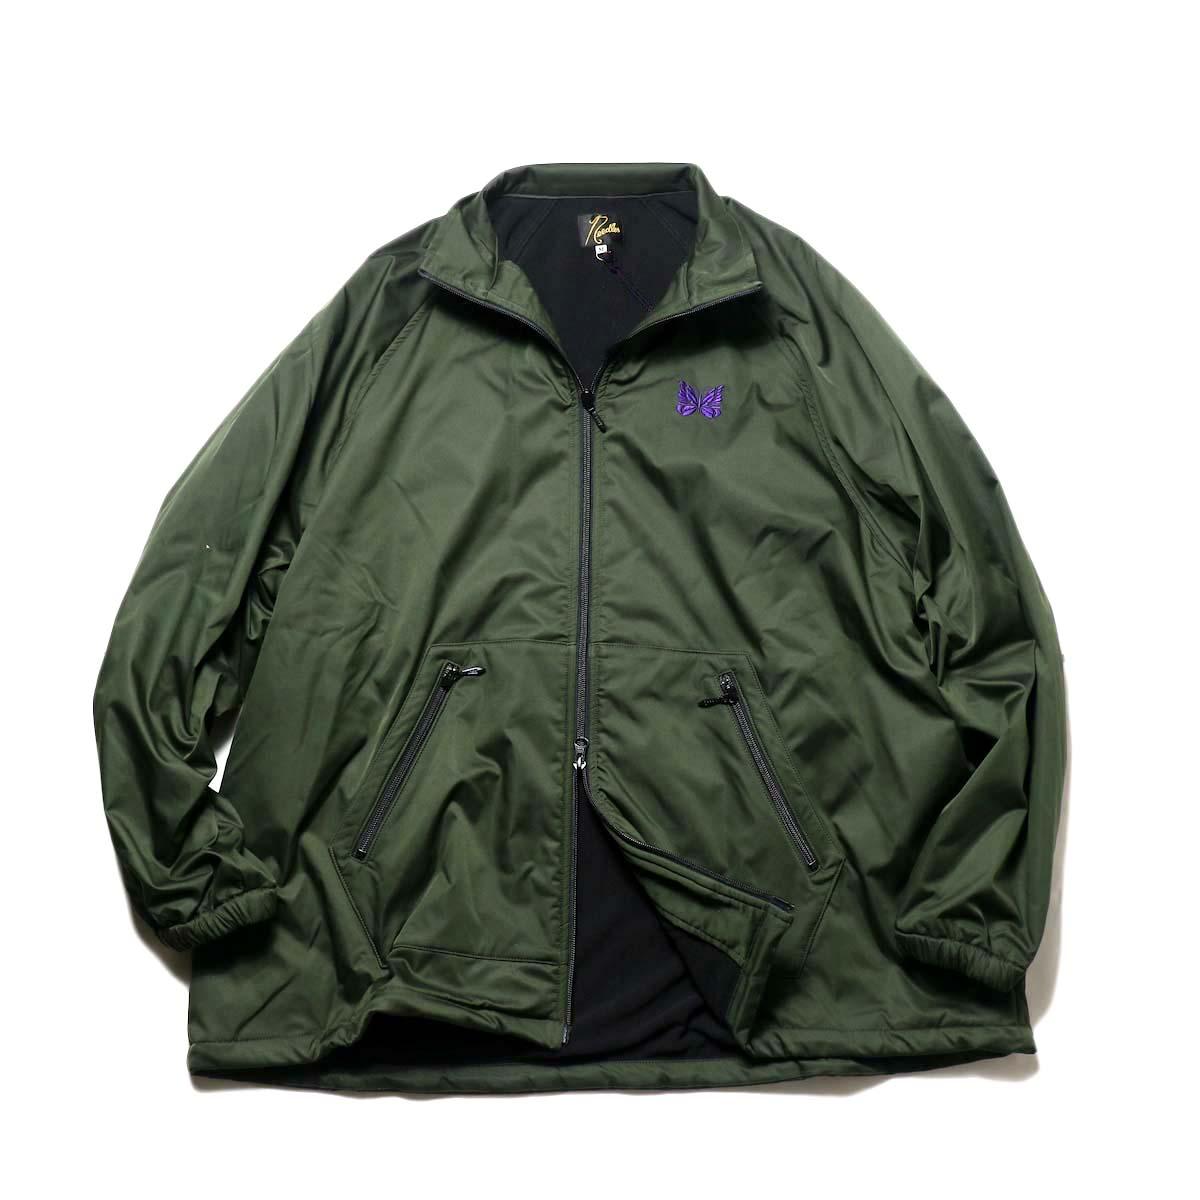 Needles / JOG Jacket - Poly Taffeta (Green)